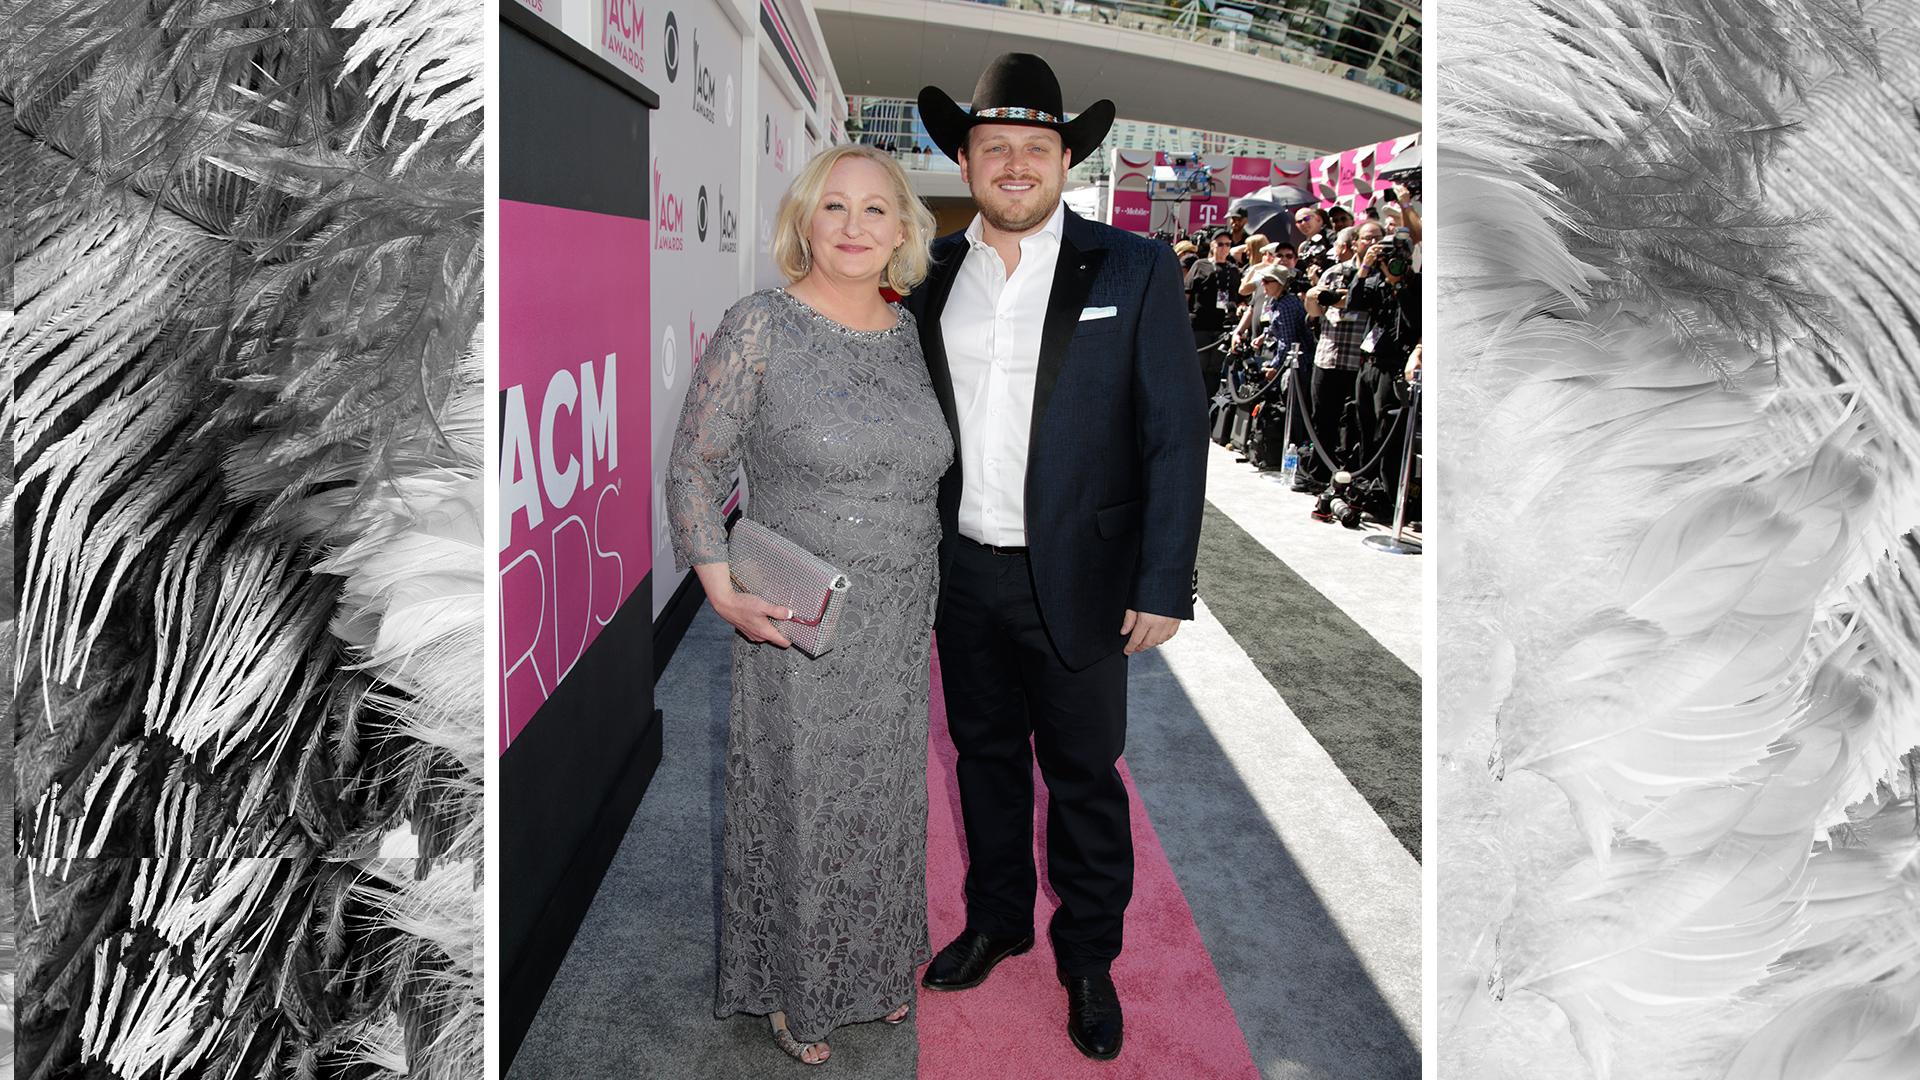 Josh Abbott poses next to his mother, Lynette.